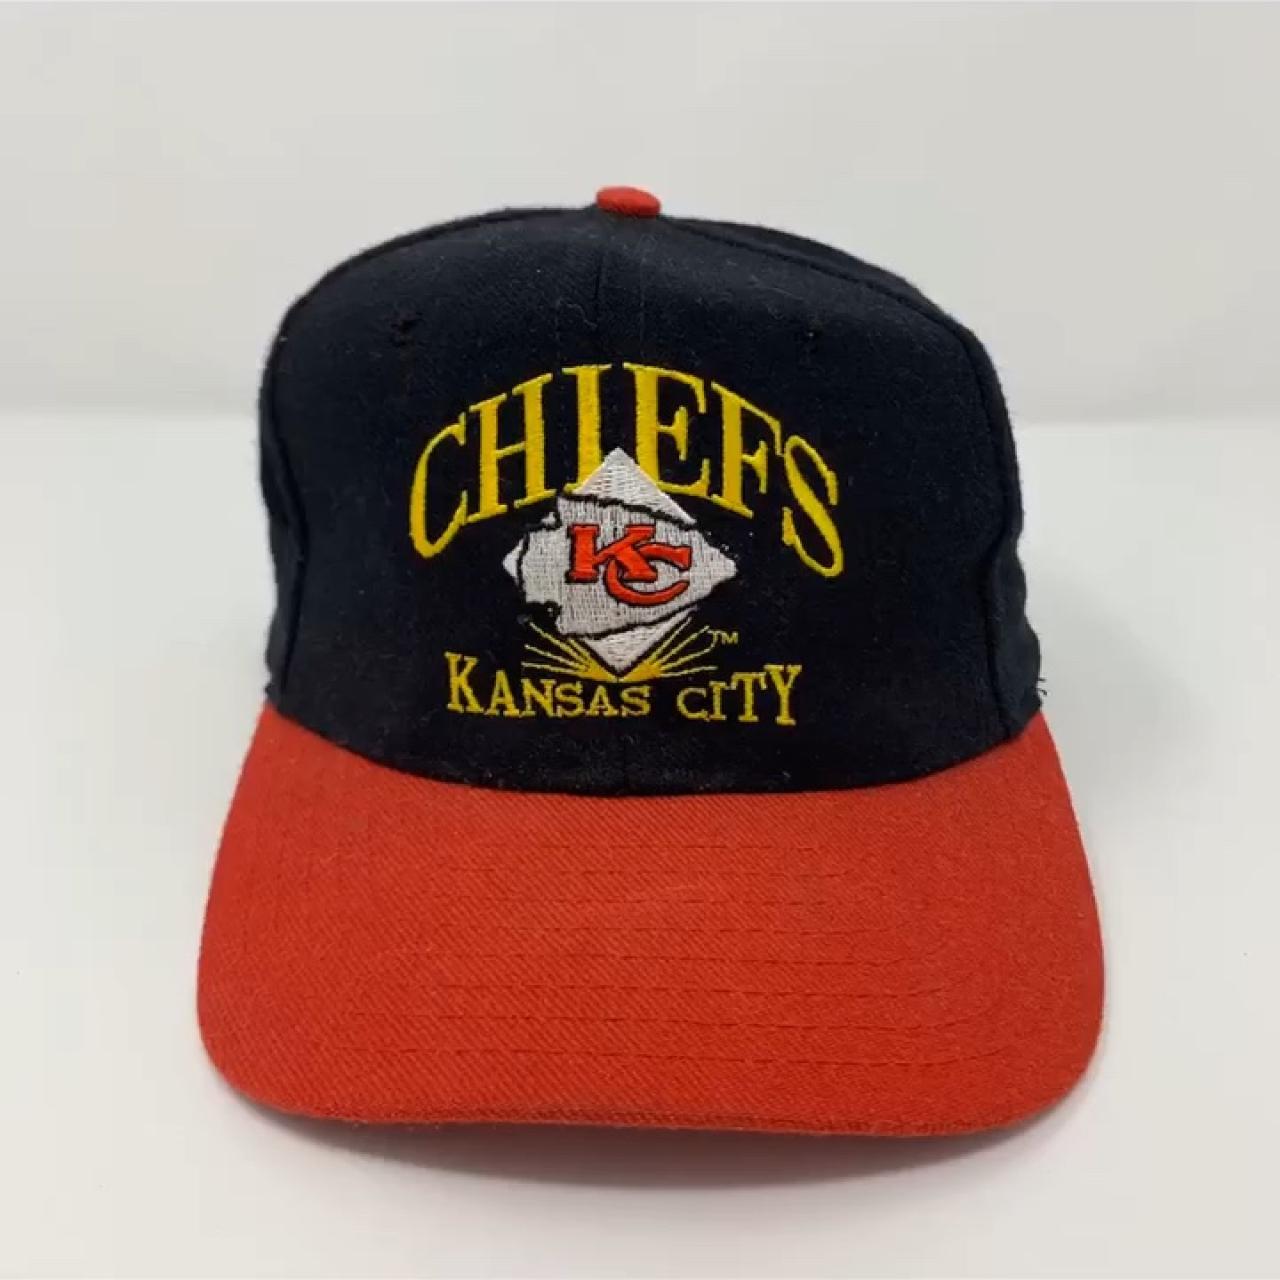 7ba41e35e0a823 🏈 Kansas City Chiefs 🏈 - Vintage KC Chiefs Cap - Snap on - Depop